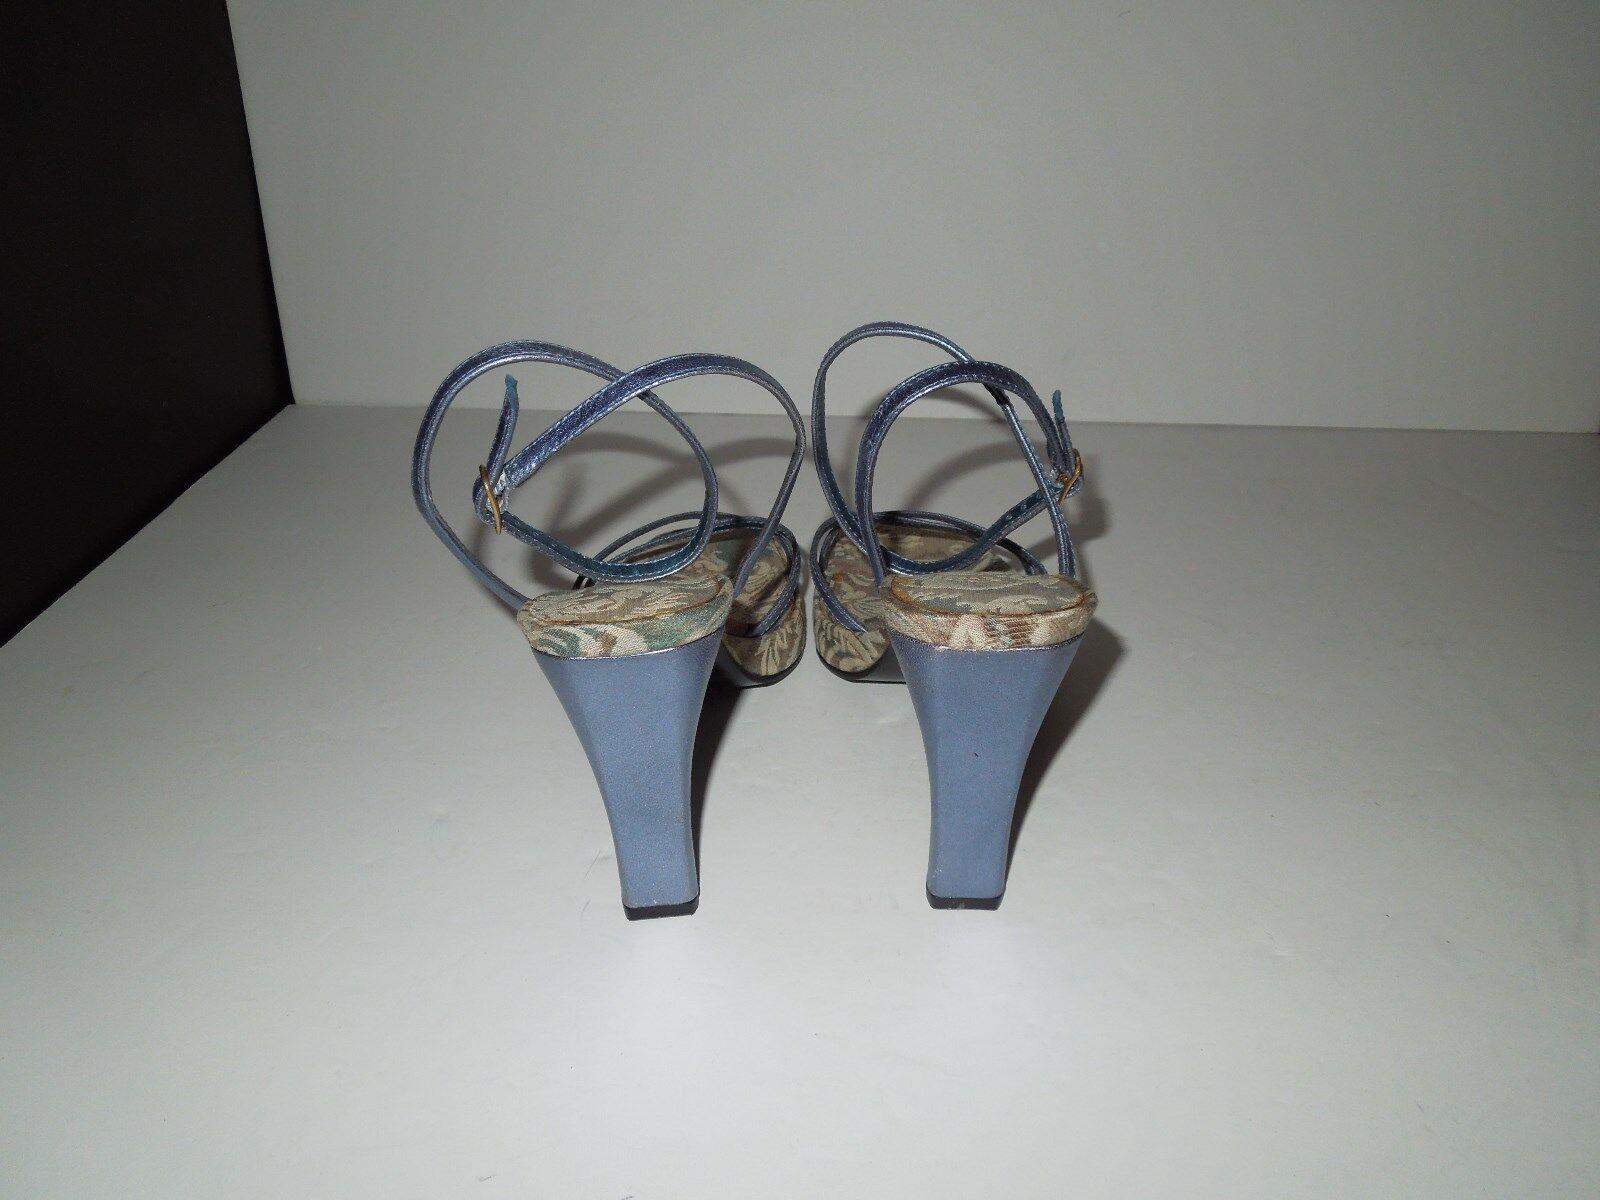 NWOT Nine West Leather R-Soulmate Metallic Blau Leather West Platform Ankle Strap Sandals 7M 34ff6c